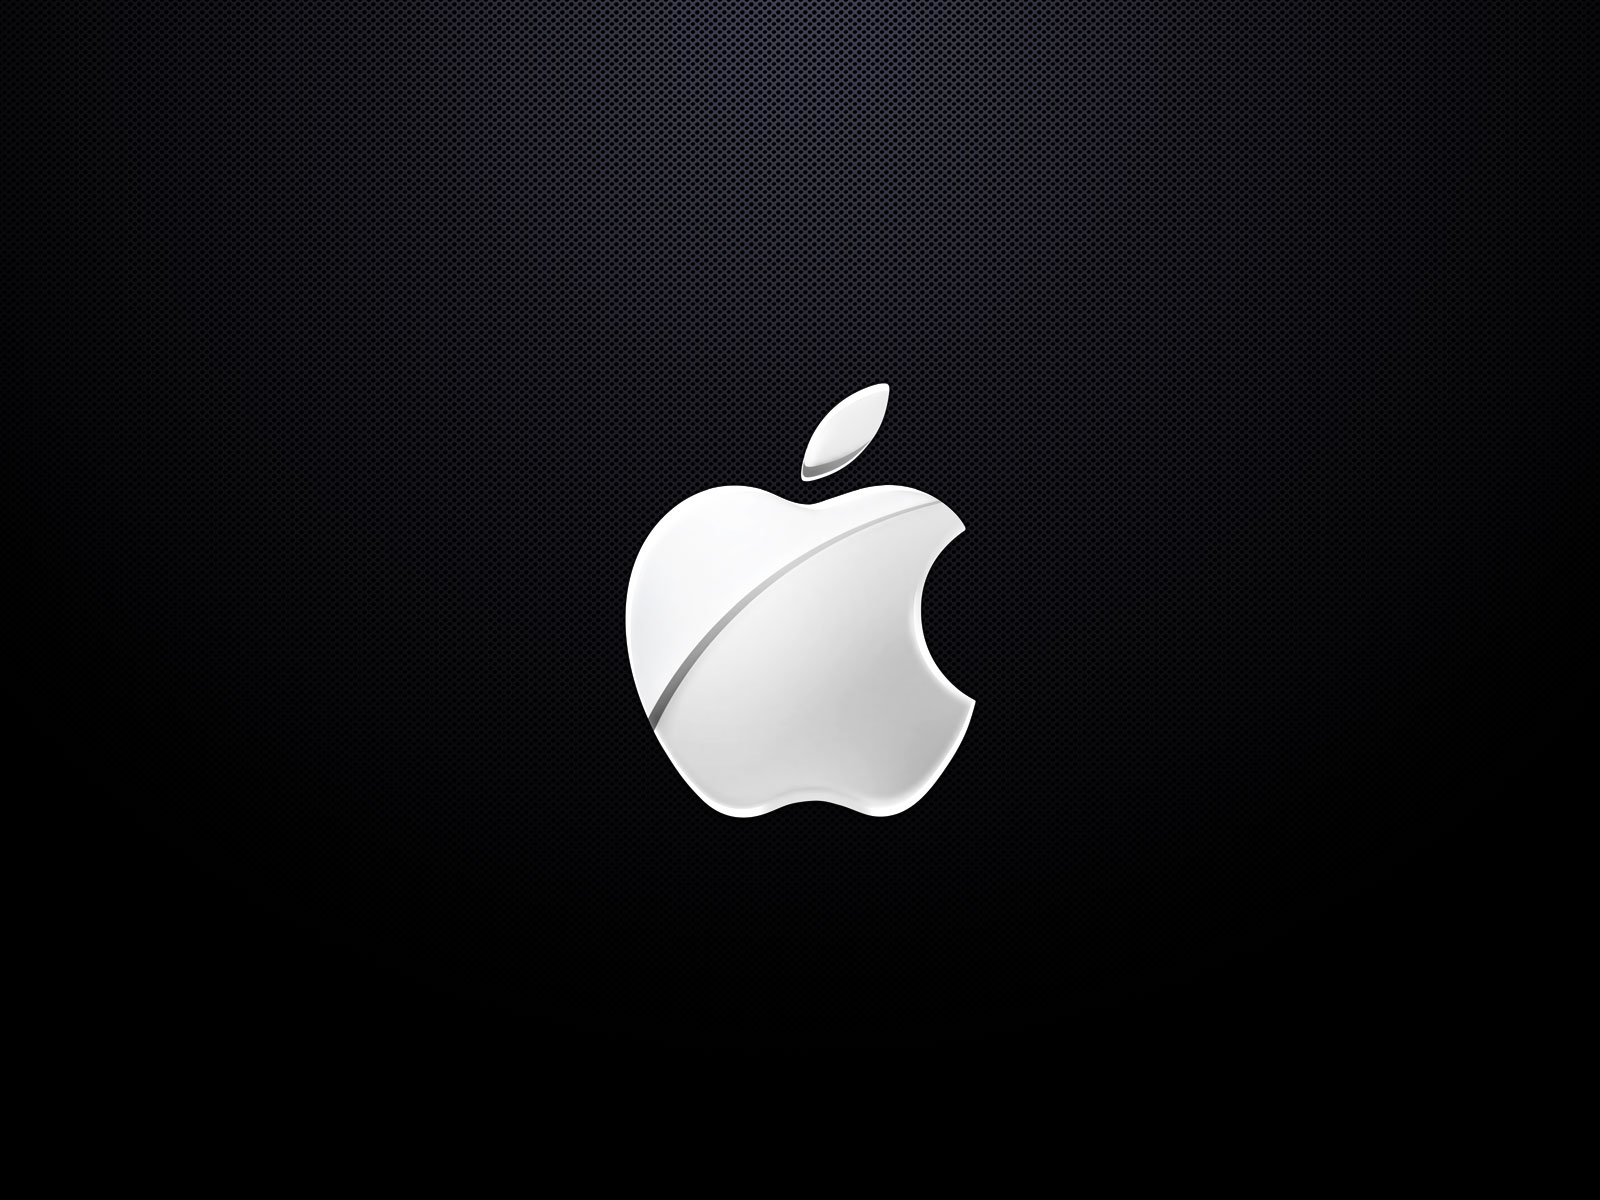 http://1.bp.blogspot.com/-Ts_De40hqWI/TxGAoTq-ZOI/AAAAAAAAAGA/DbCjjgWPPwM/s1600/white-apple-logo-wallpaper.jpg